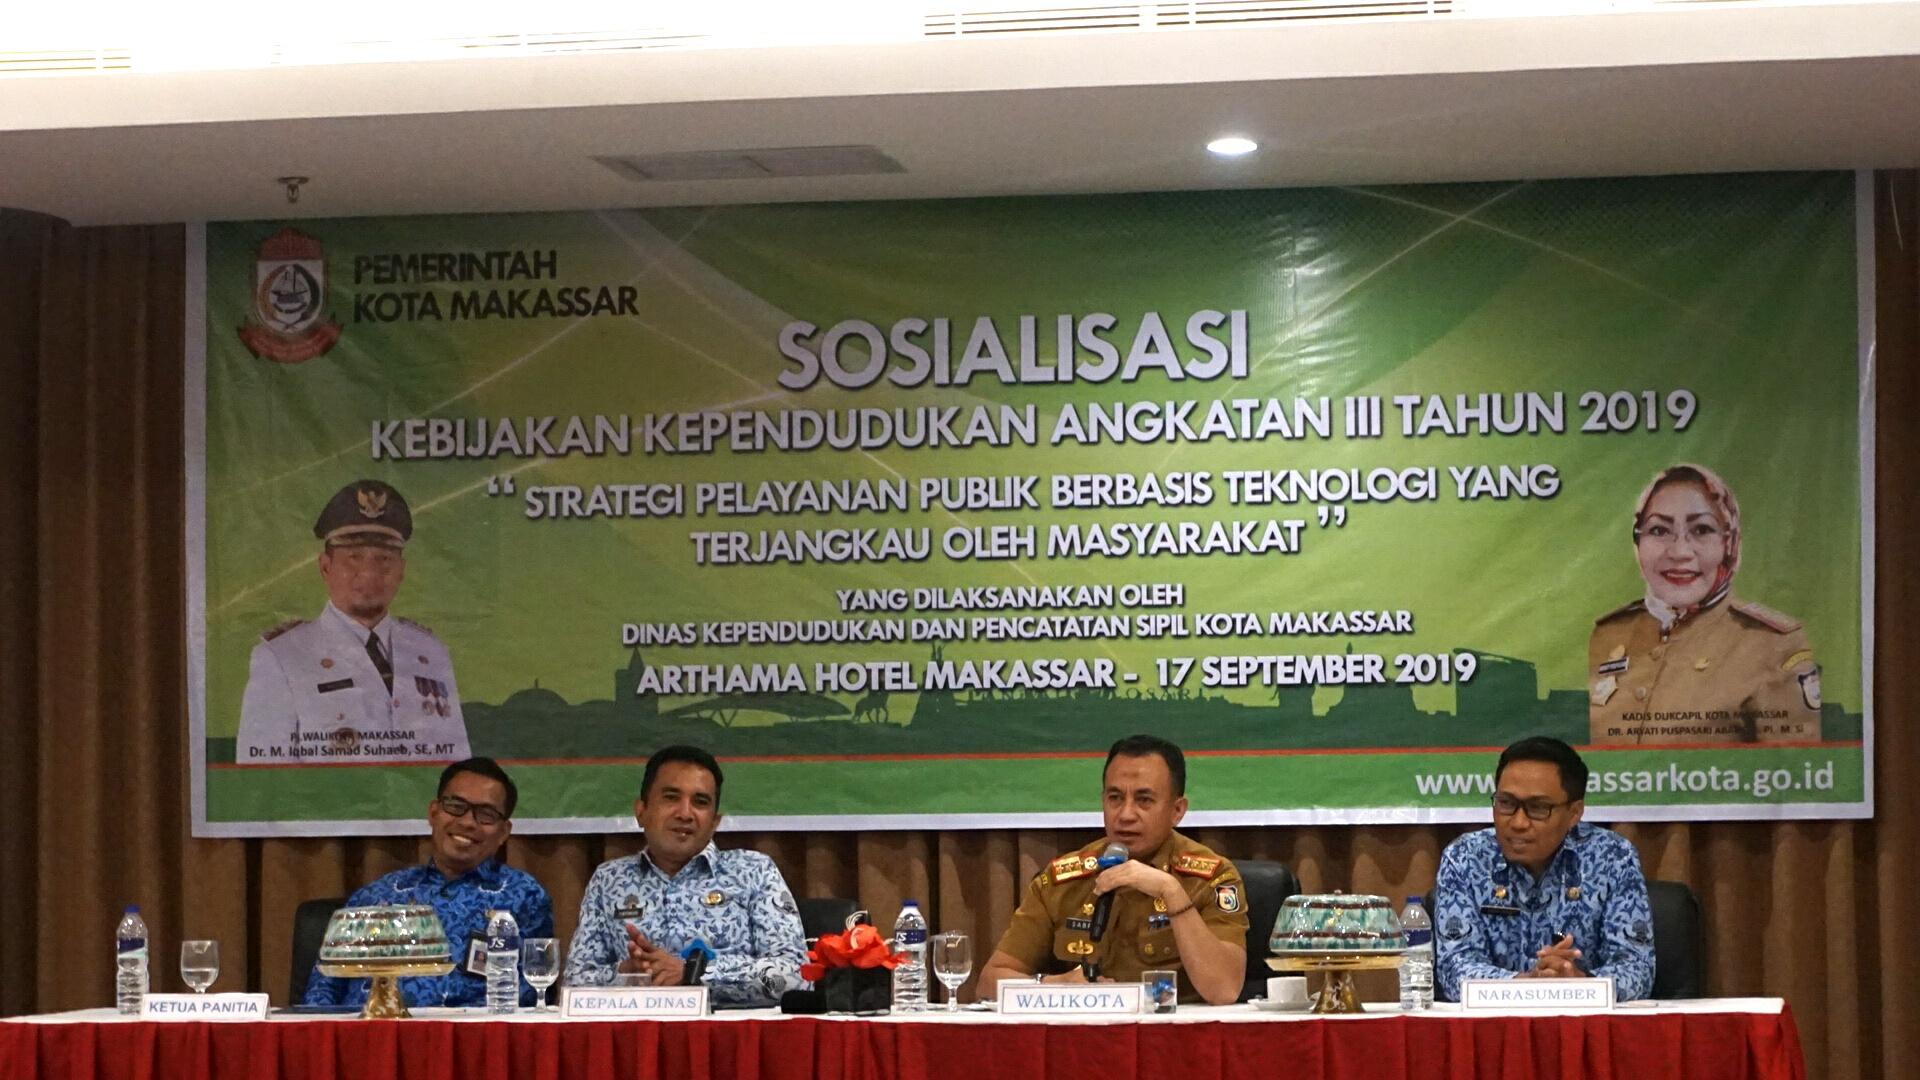 Disdukcapil kota Makassar